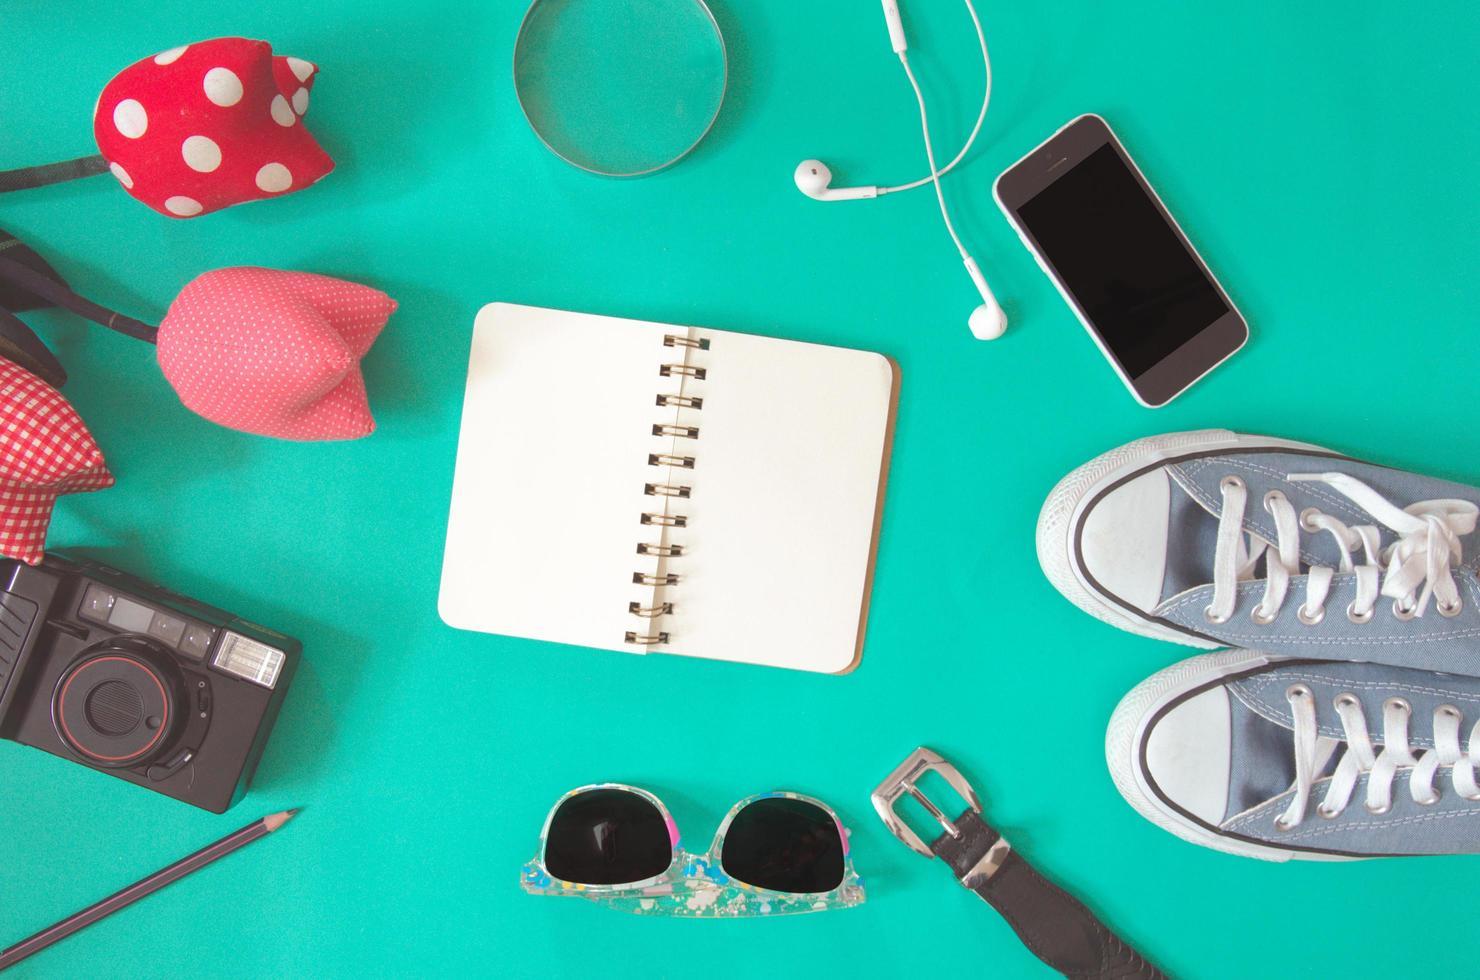 Flat lay of notebook, sunglasses, camera, and converse photo